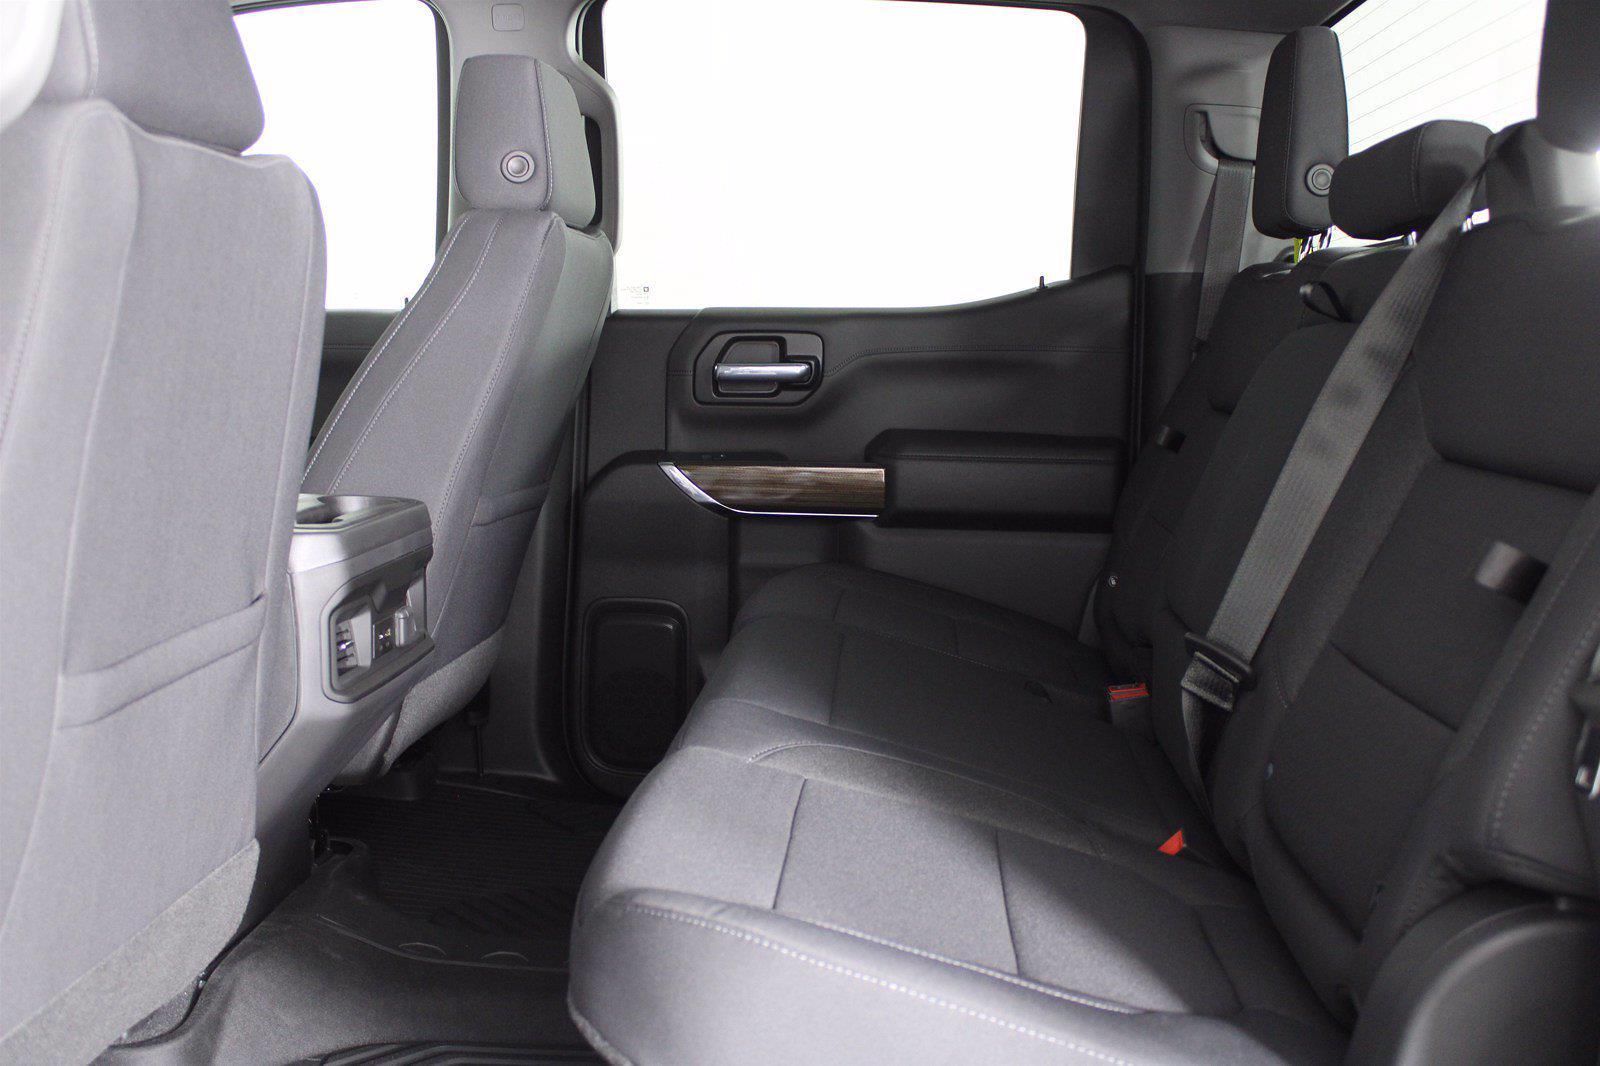 2021 Chevrolet Silverado 1500 Crew Cab 4x4, Pickup #D111110 - photo 16